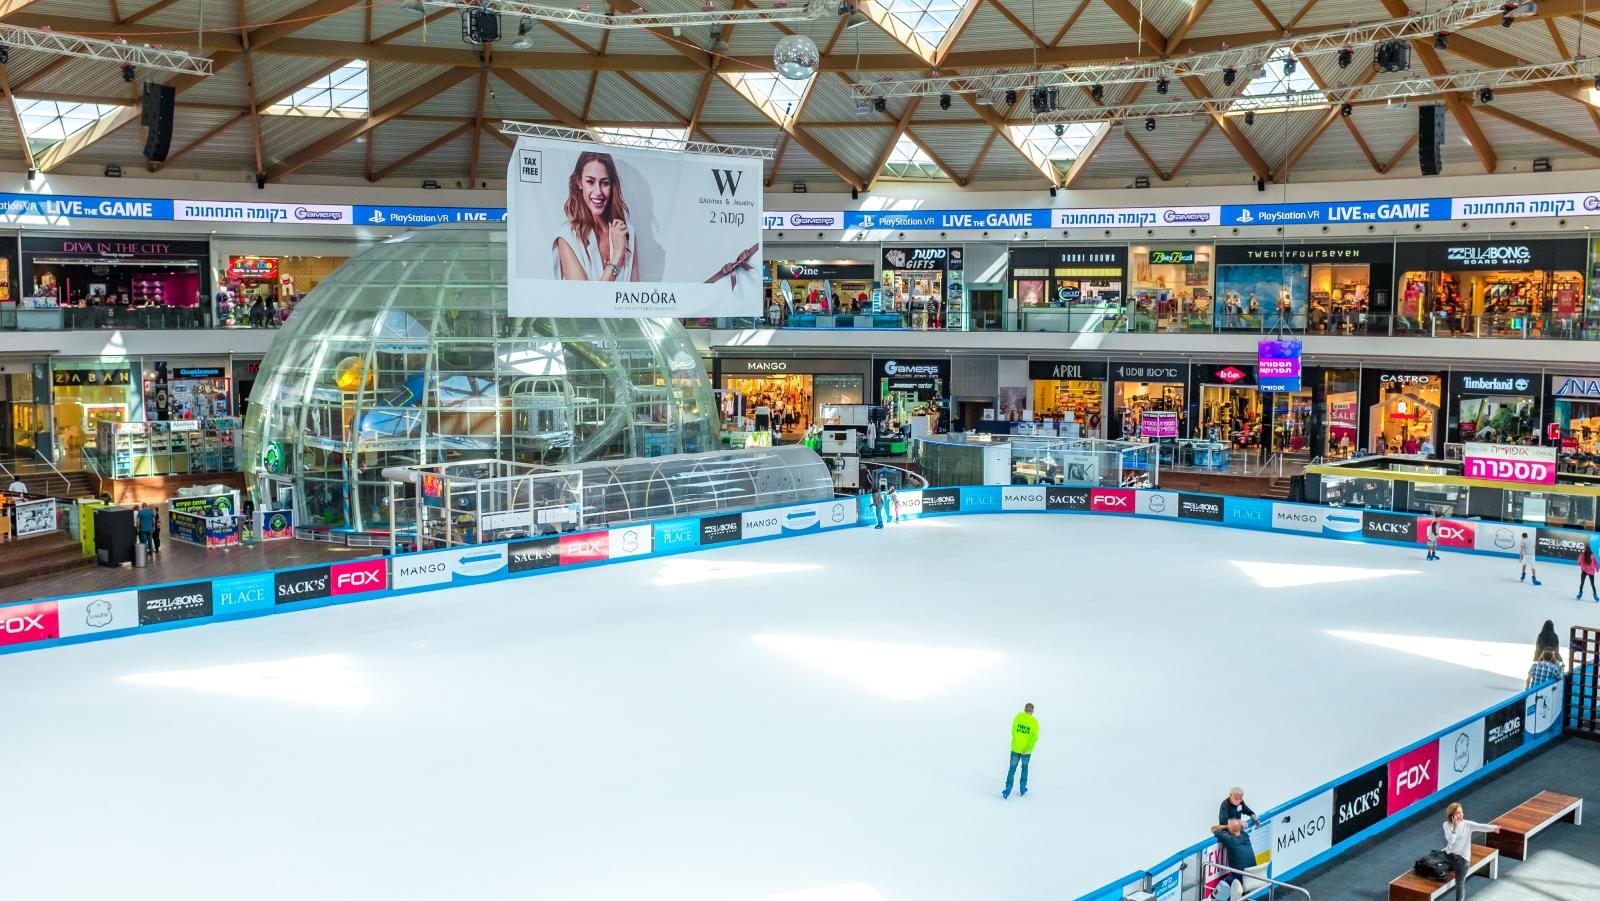 Centro comercial Ice en Eilat. Foto: Denzel9/Shutterstock.com